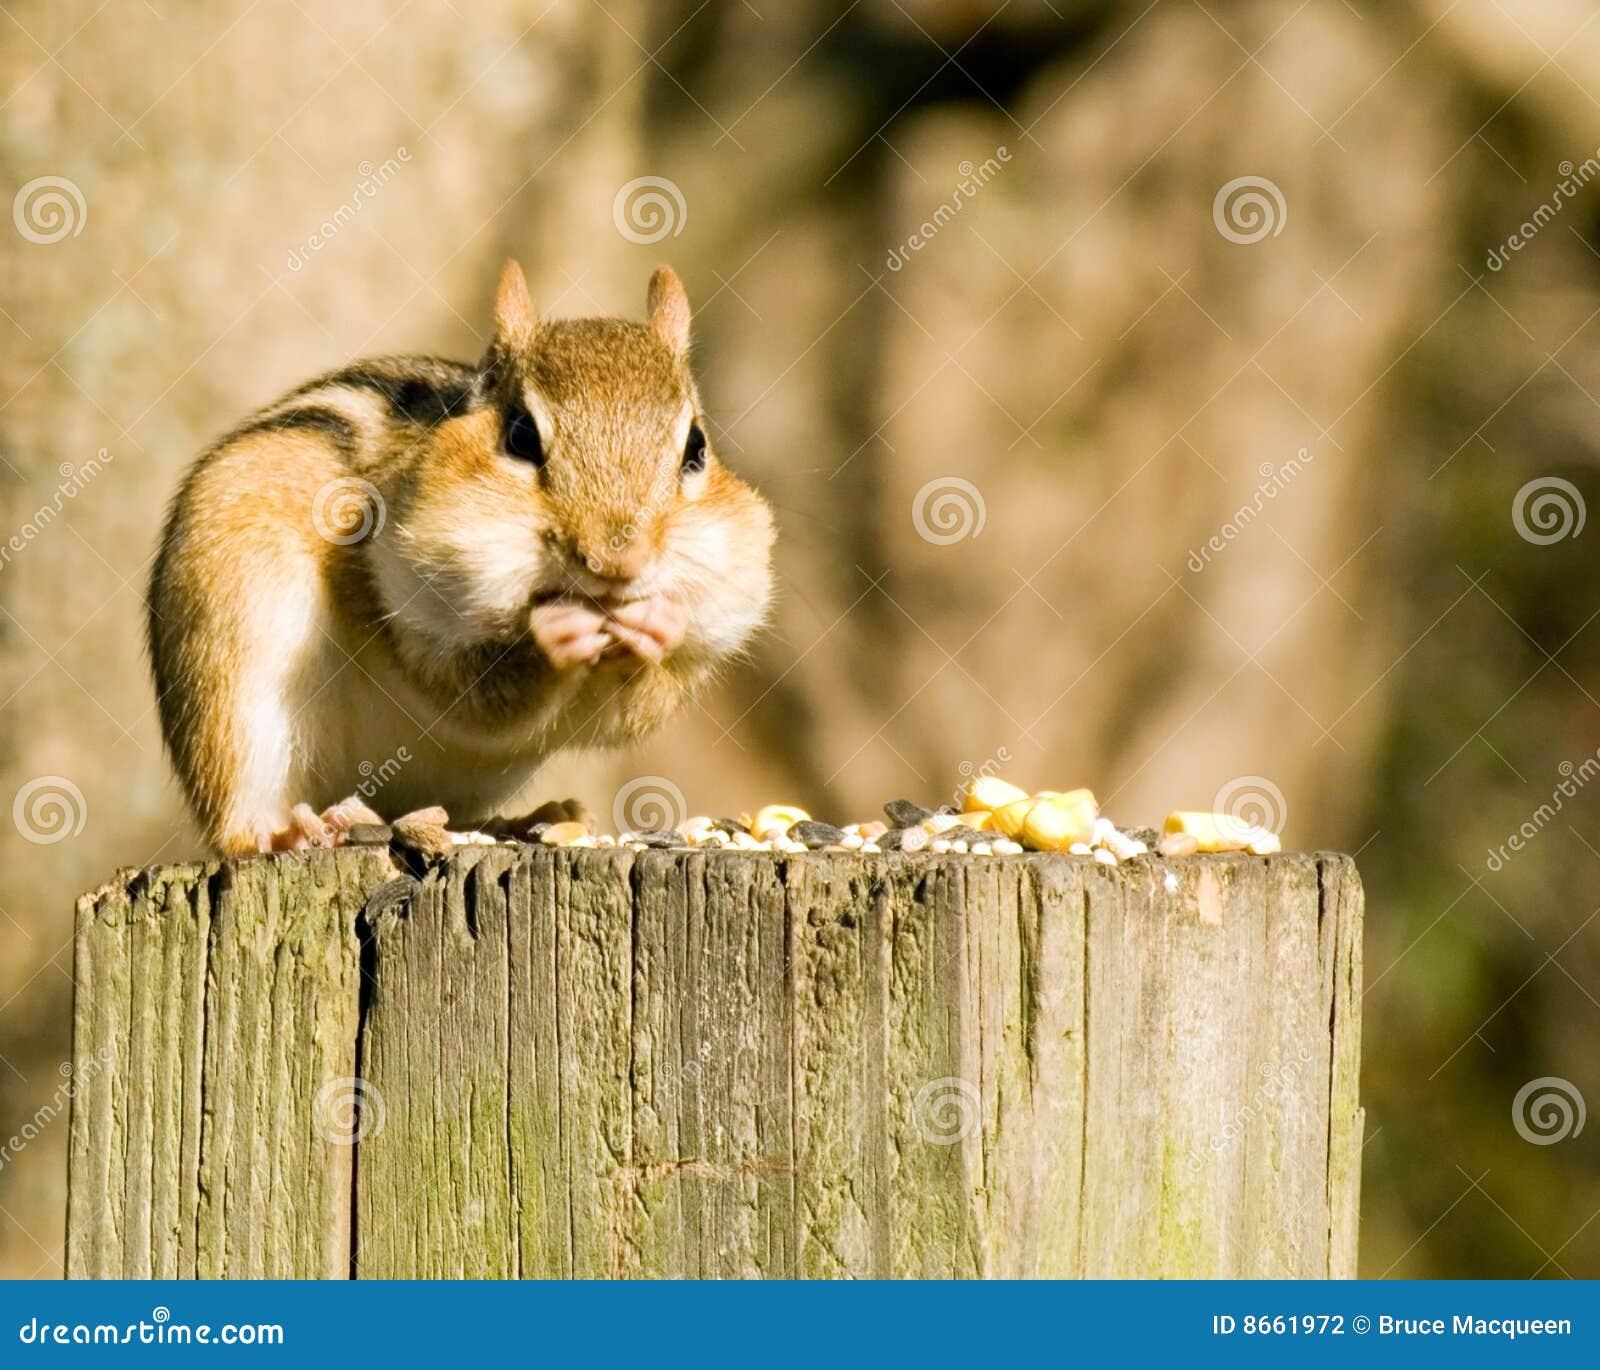 Chipmunk On A Post